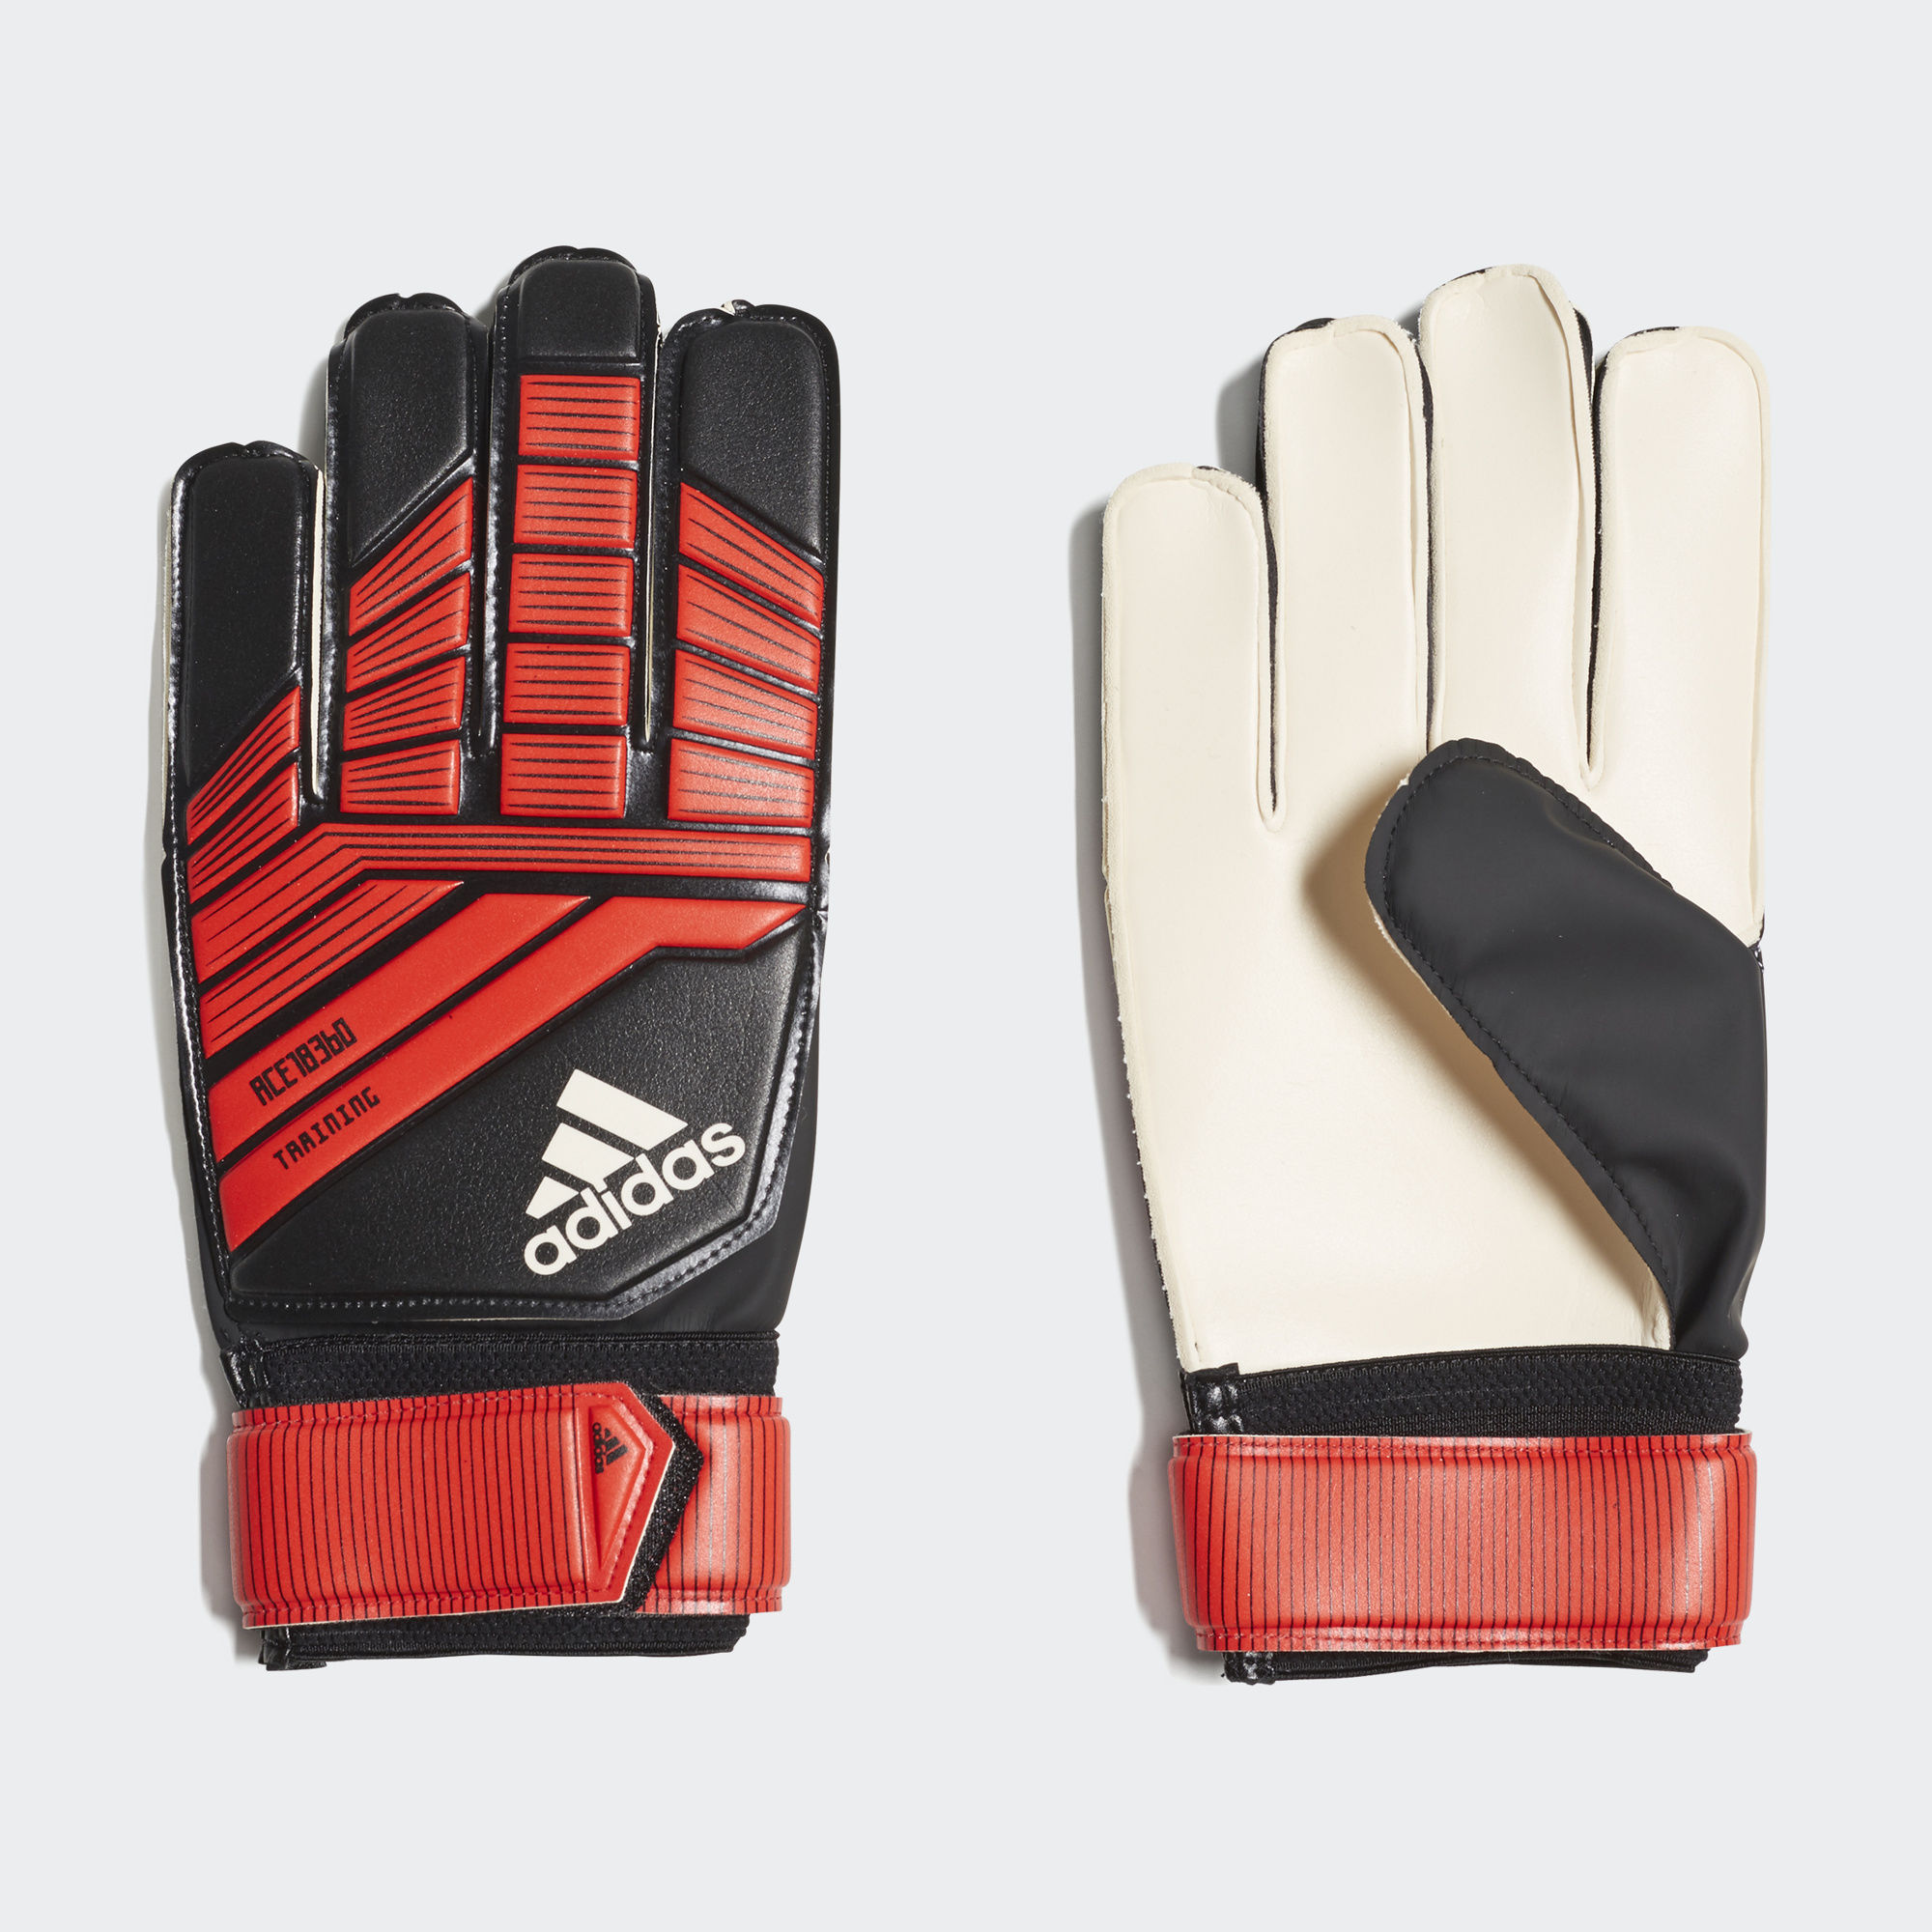 Вратарские перчатки Predator Training CW5602 adidas Performance - Украина  debaa63a6c29a